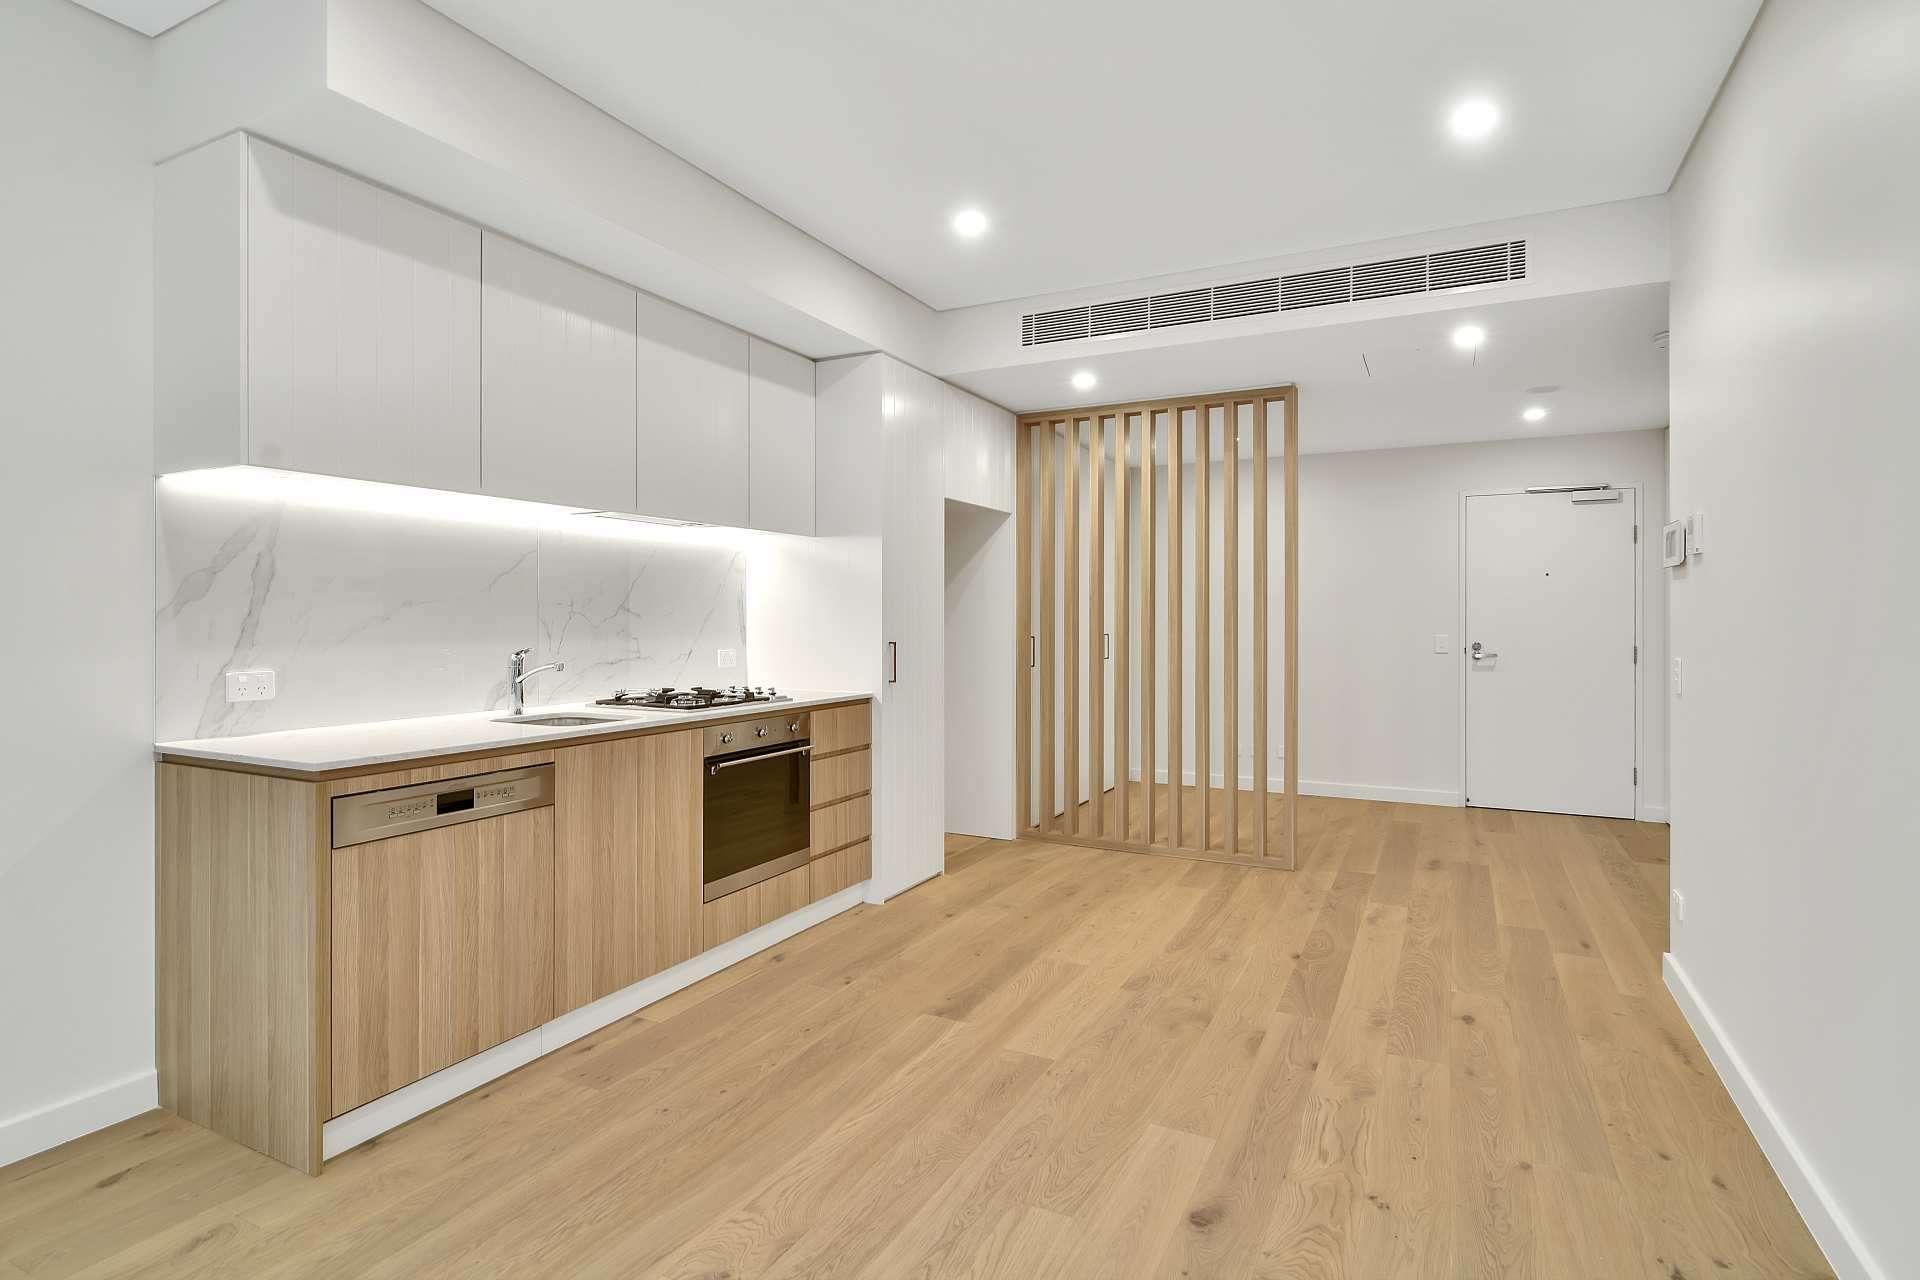 C240/5 Stovemaker Lane, Erskineville, NSW 2043